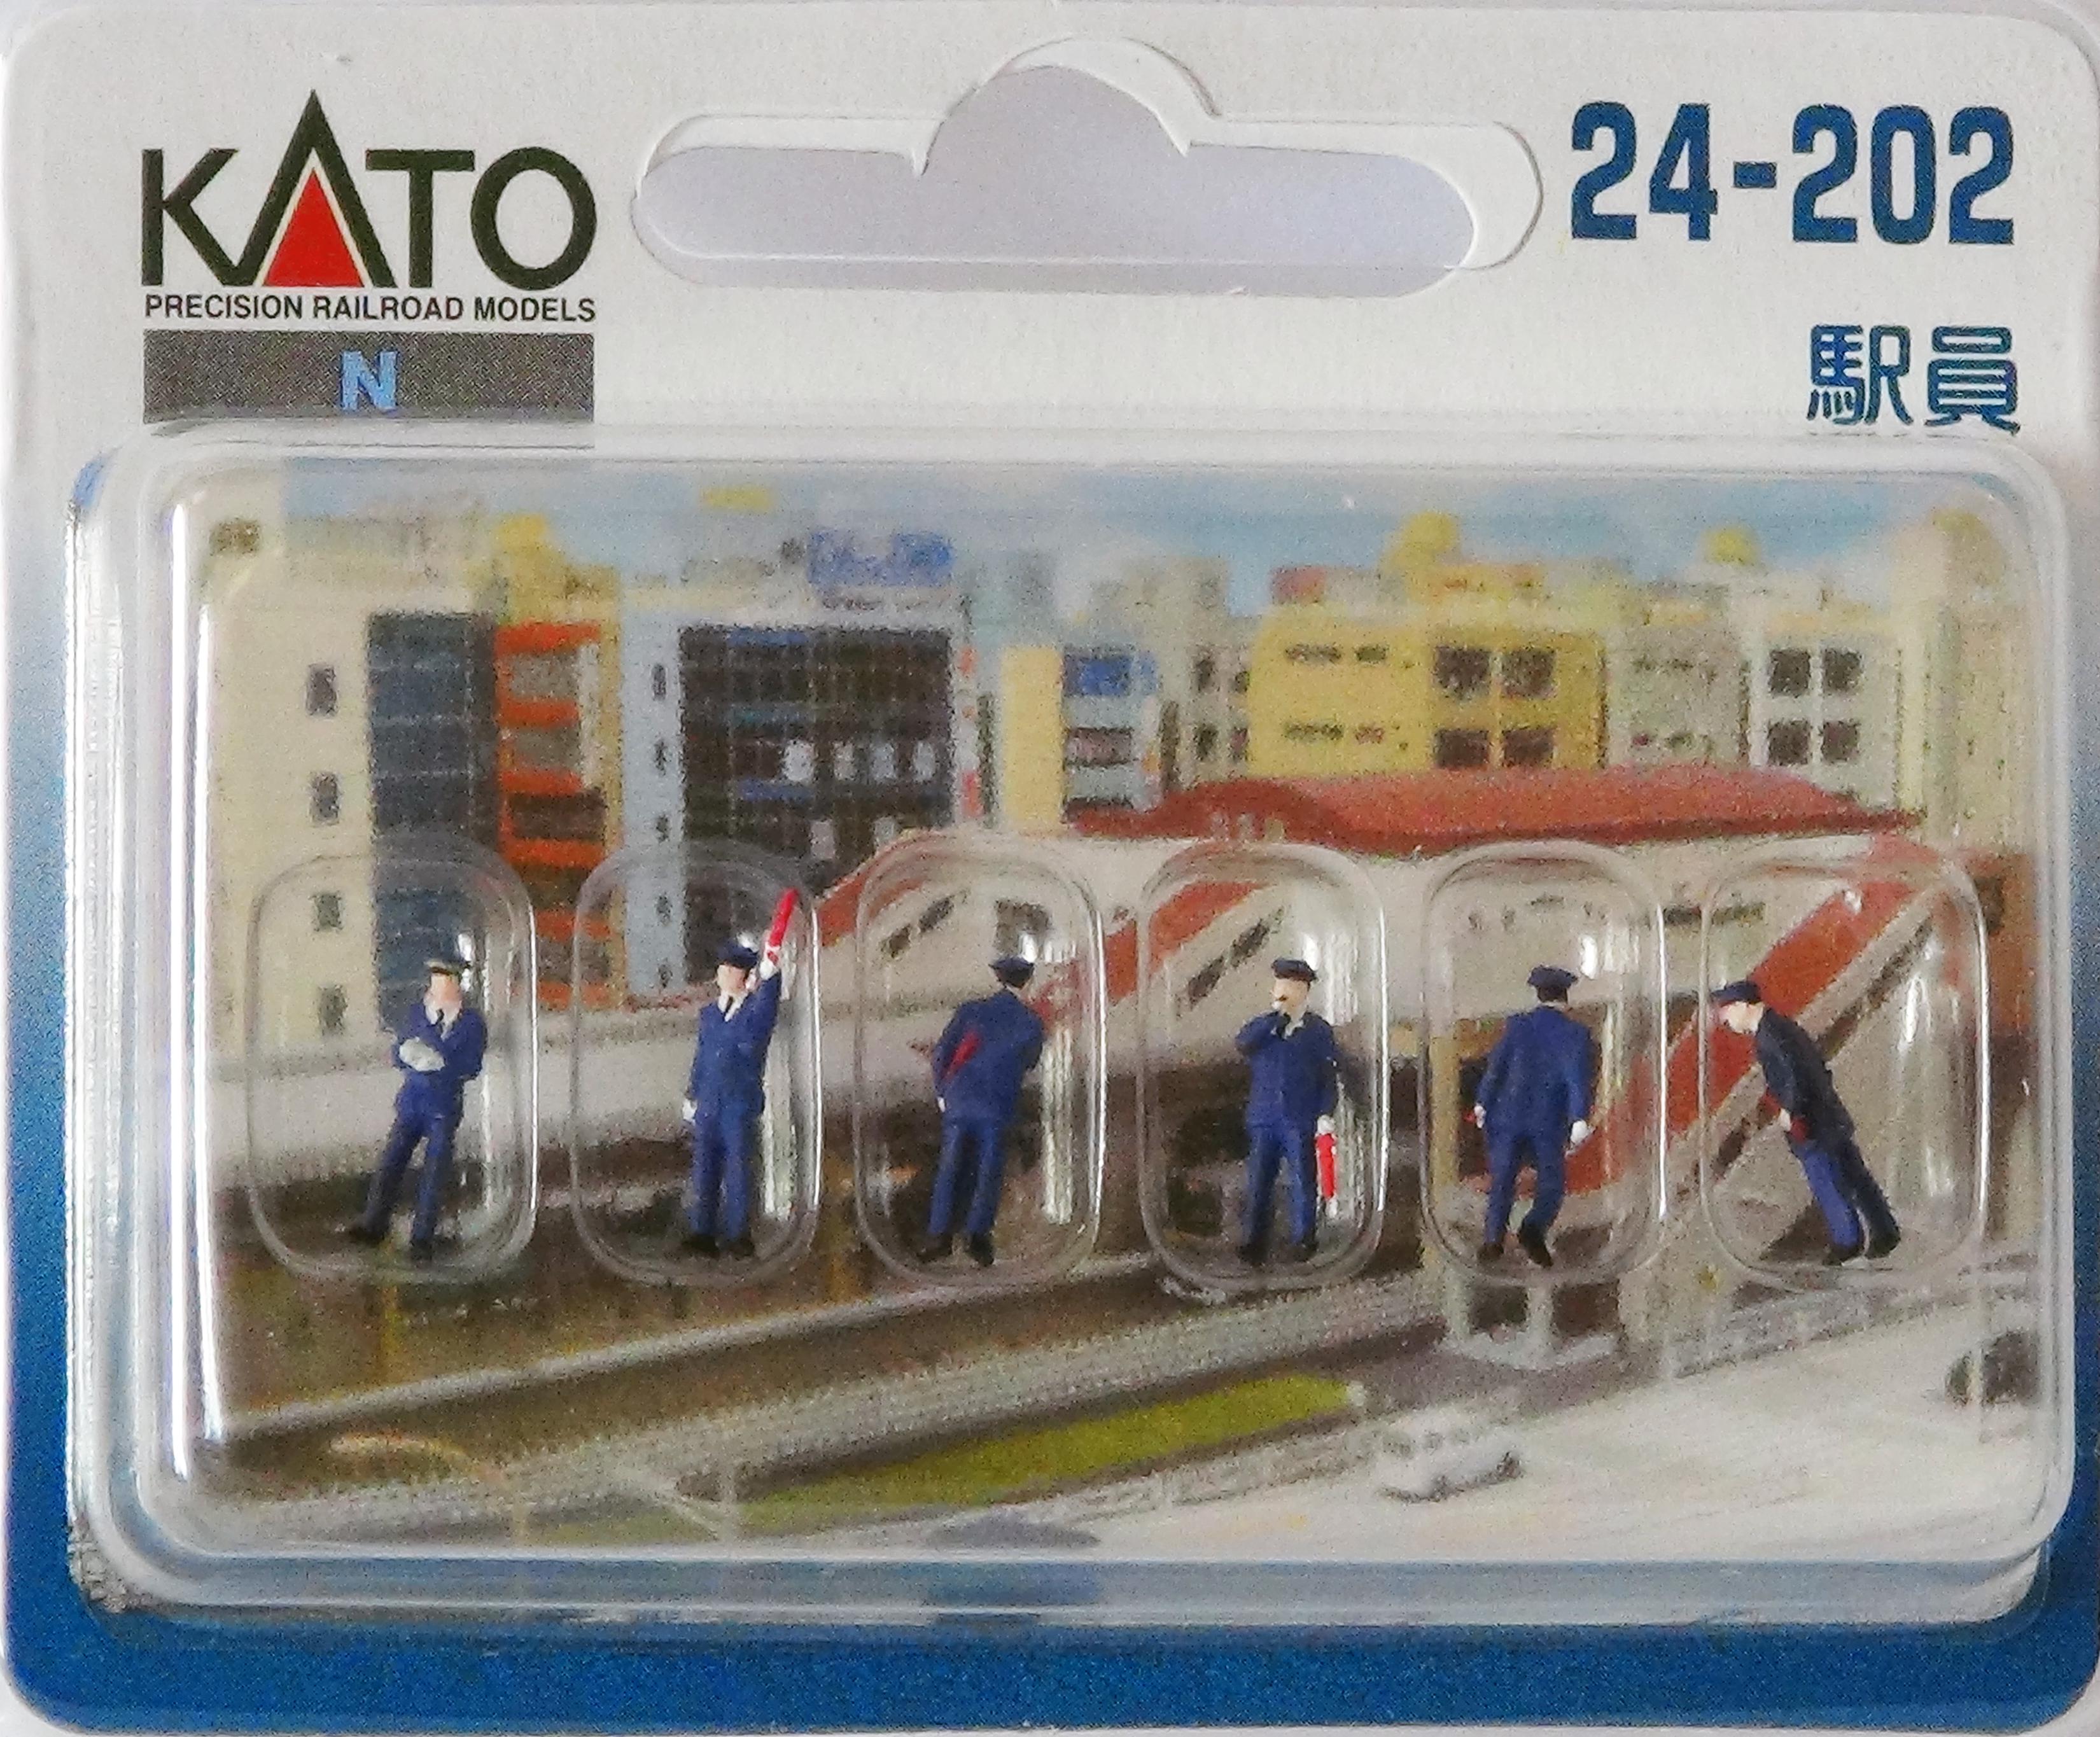 KATO 7024202 <br/>Figuren Japanisches Bahnhofsp